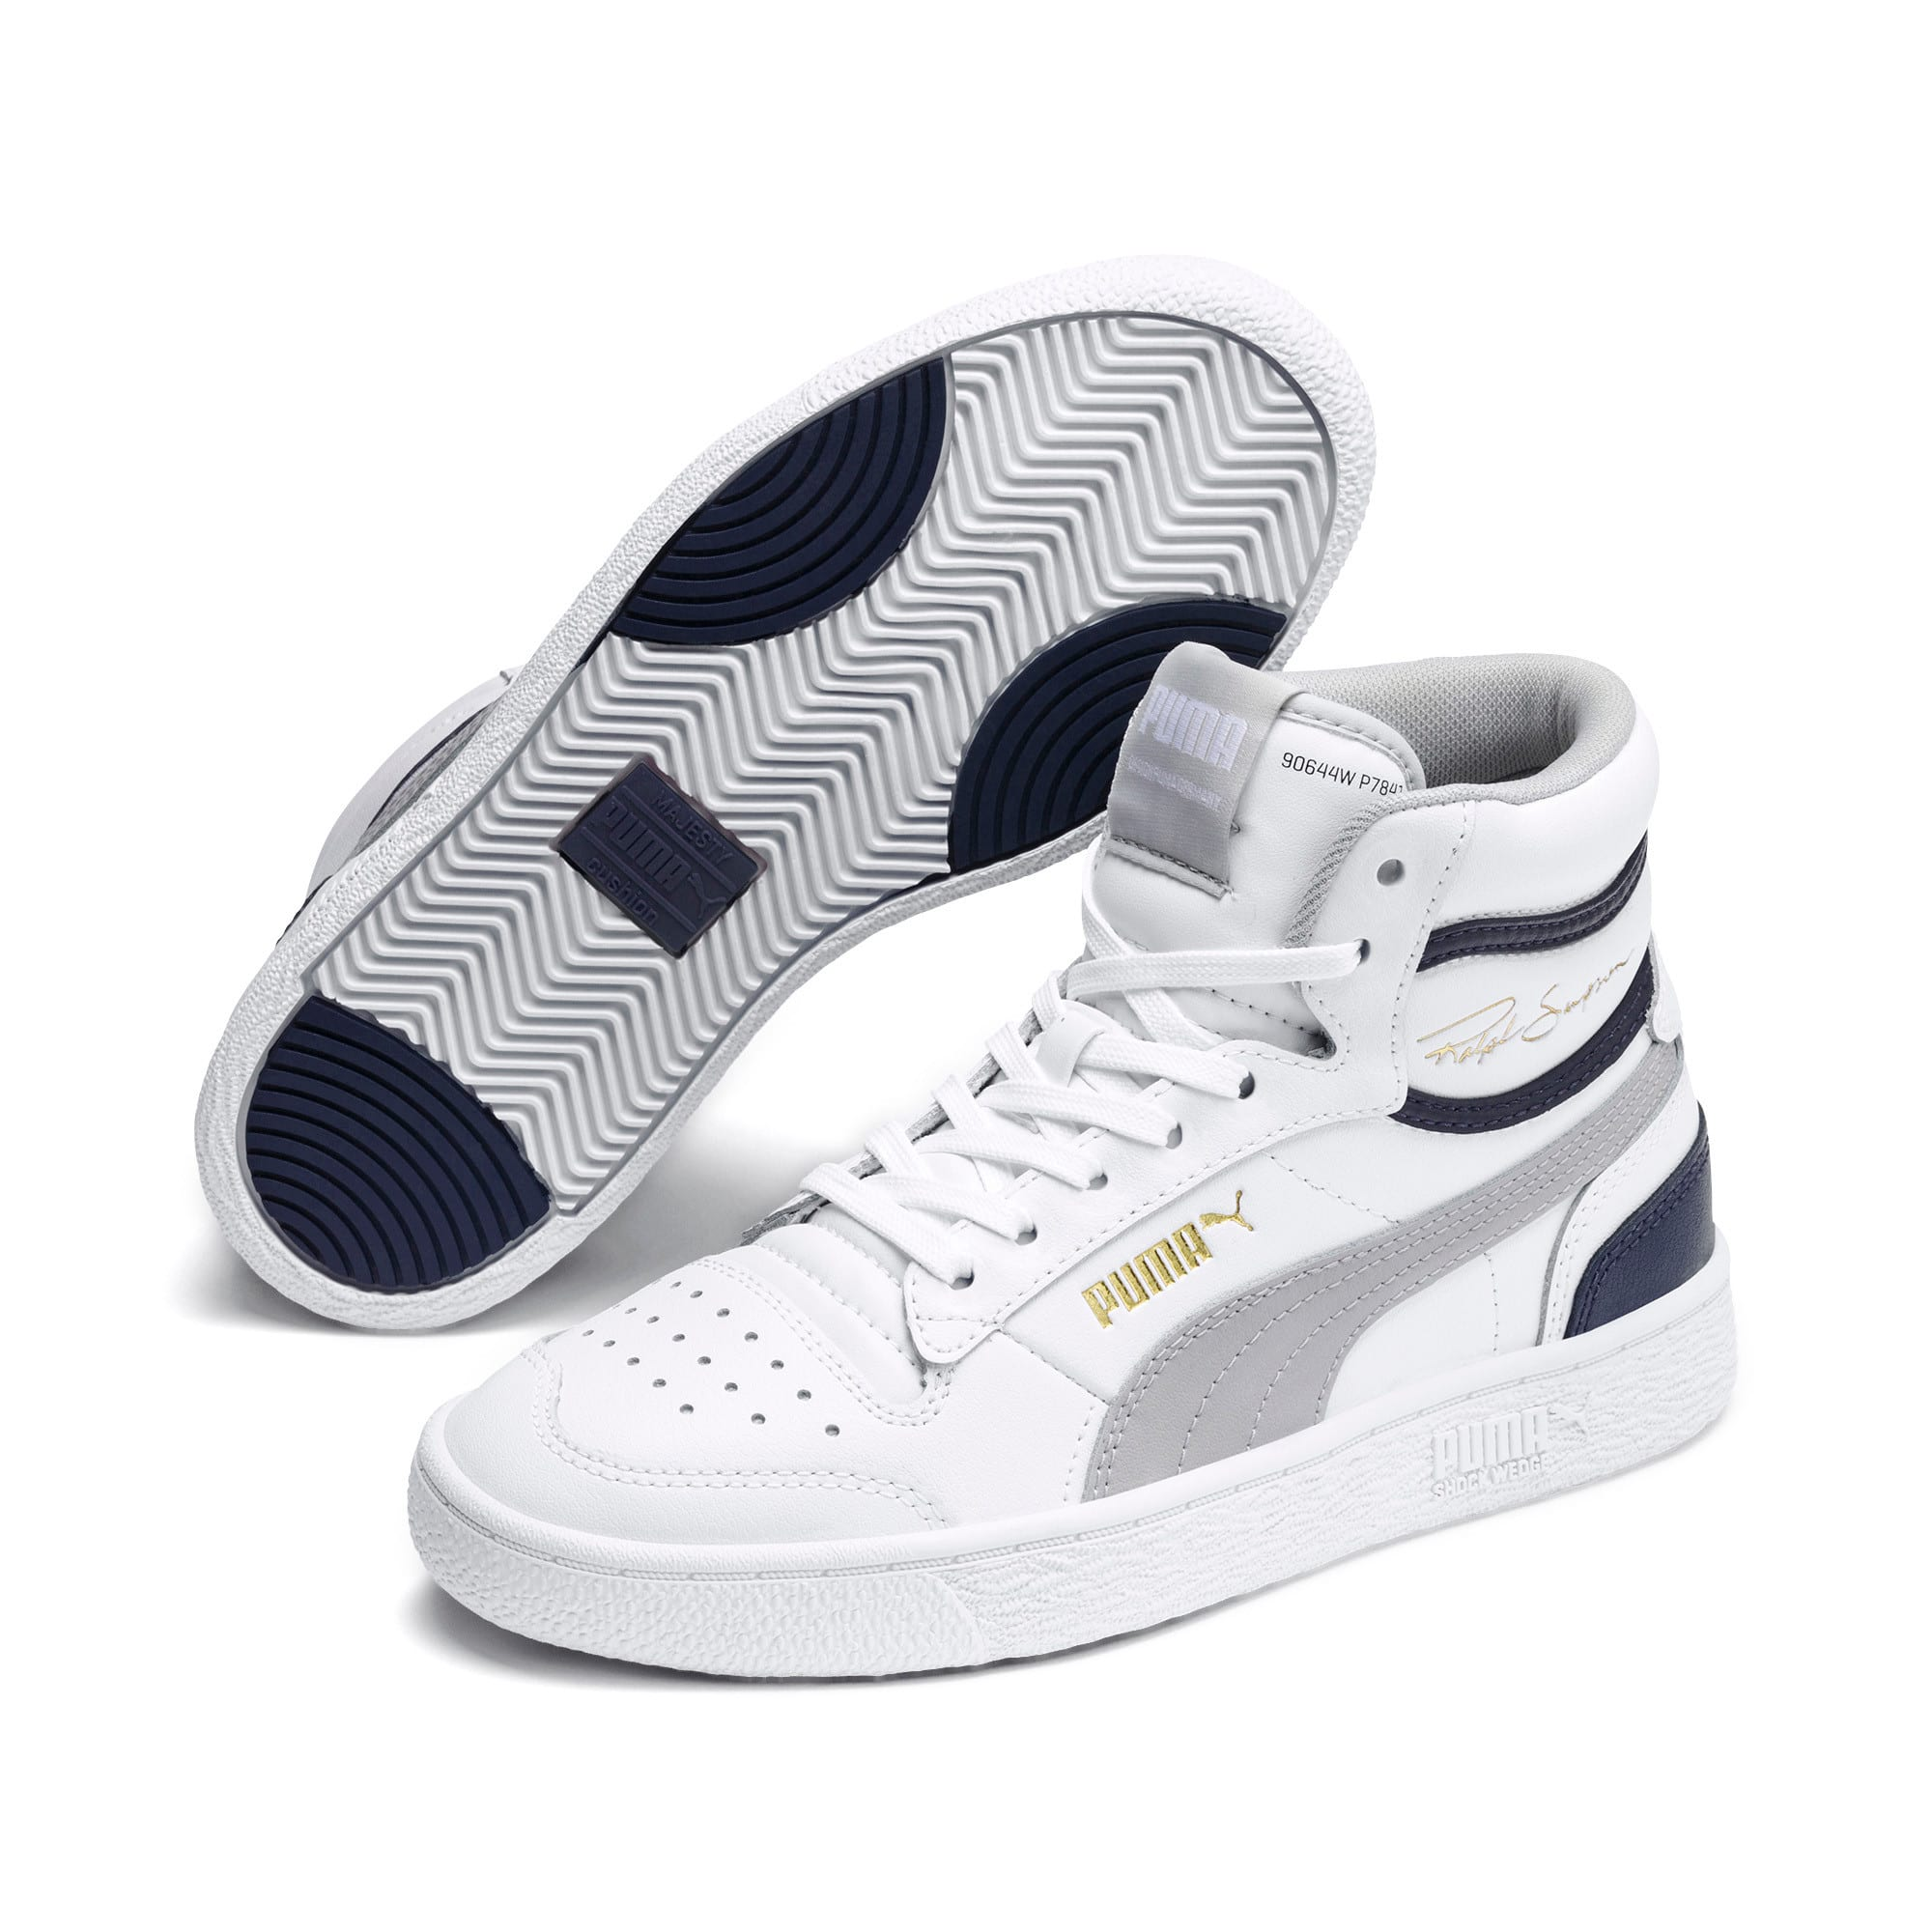 Thumbnail 2 of Ralph Sampson Mid Sneakers JR, White-Gray Violet-Peacoat, medium